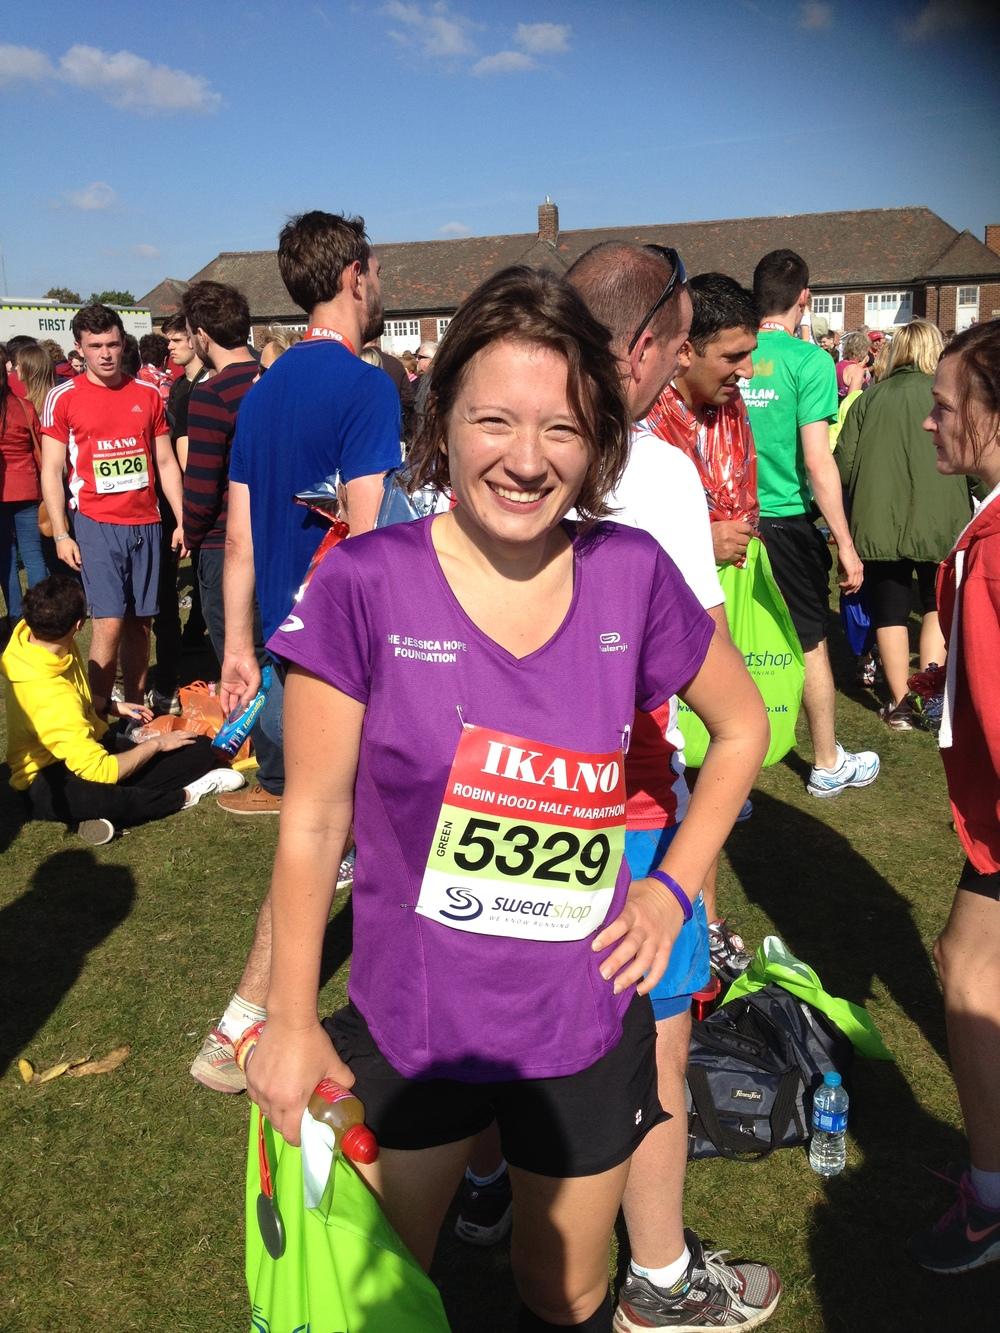 Caroline in her foundation running tee